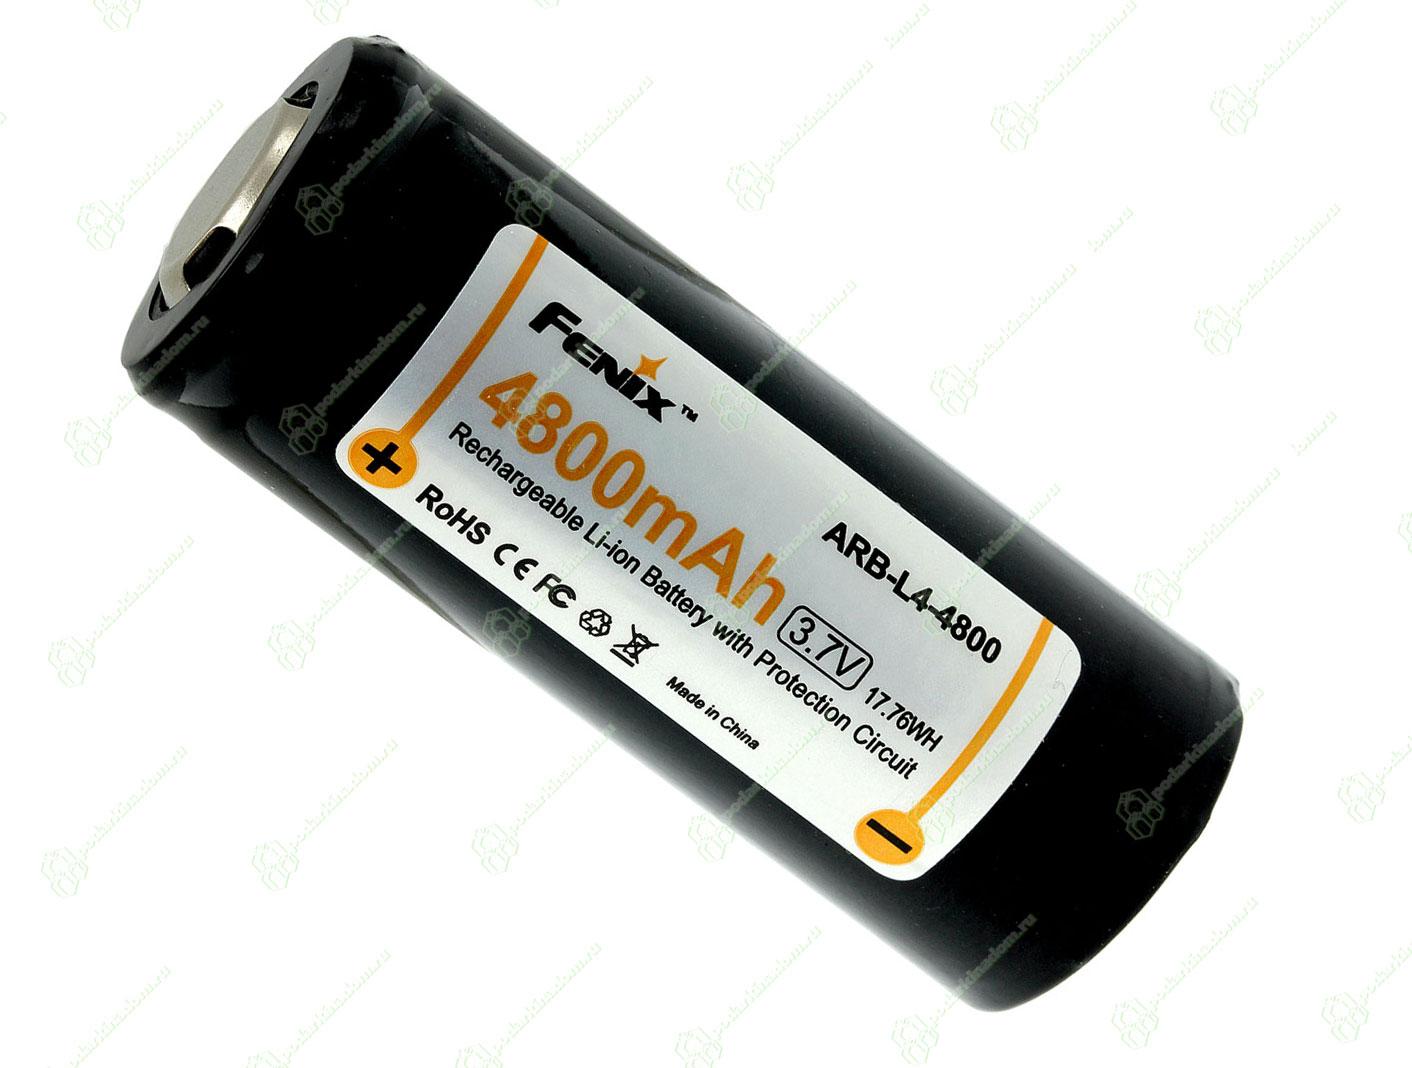 Li-ion Fenix 26650 4800 mAh